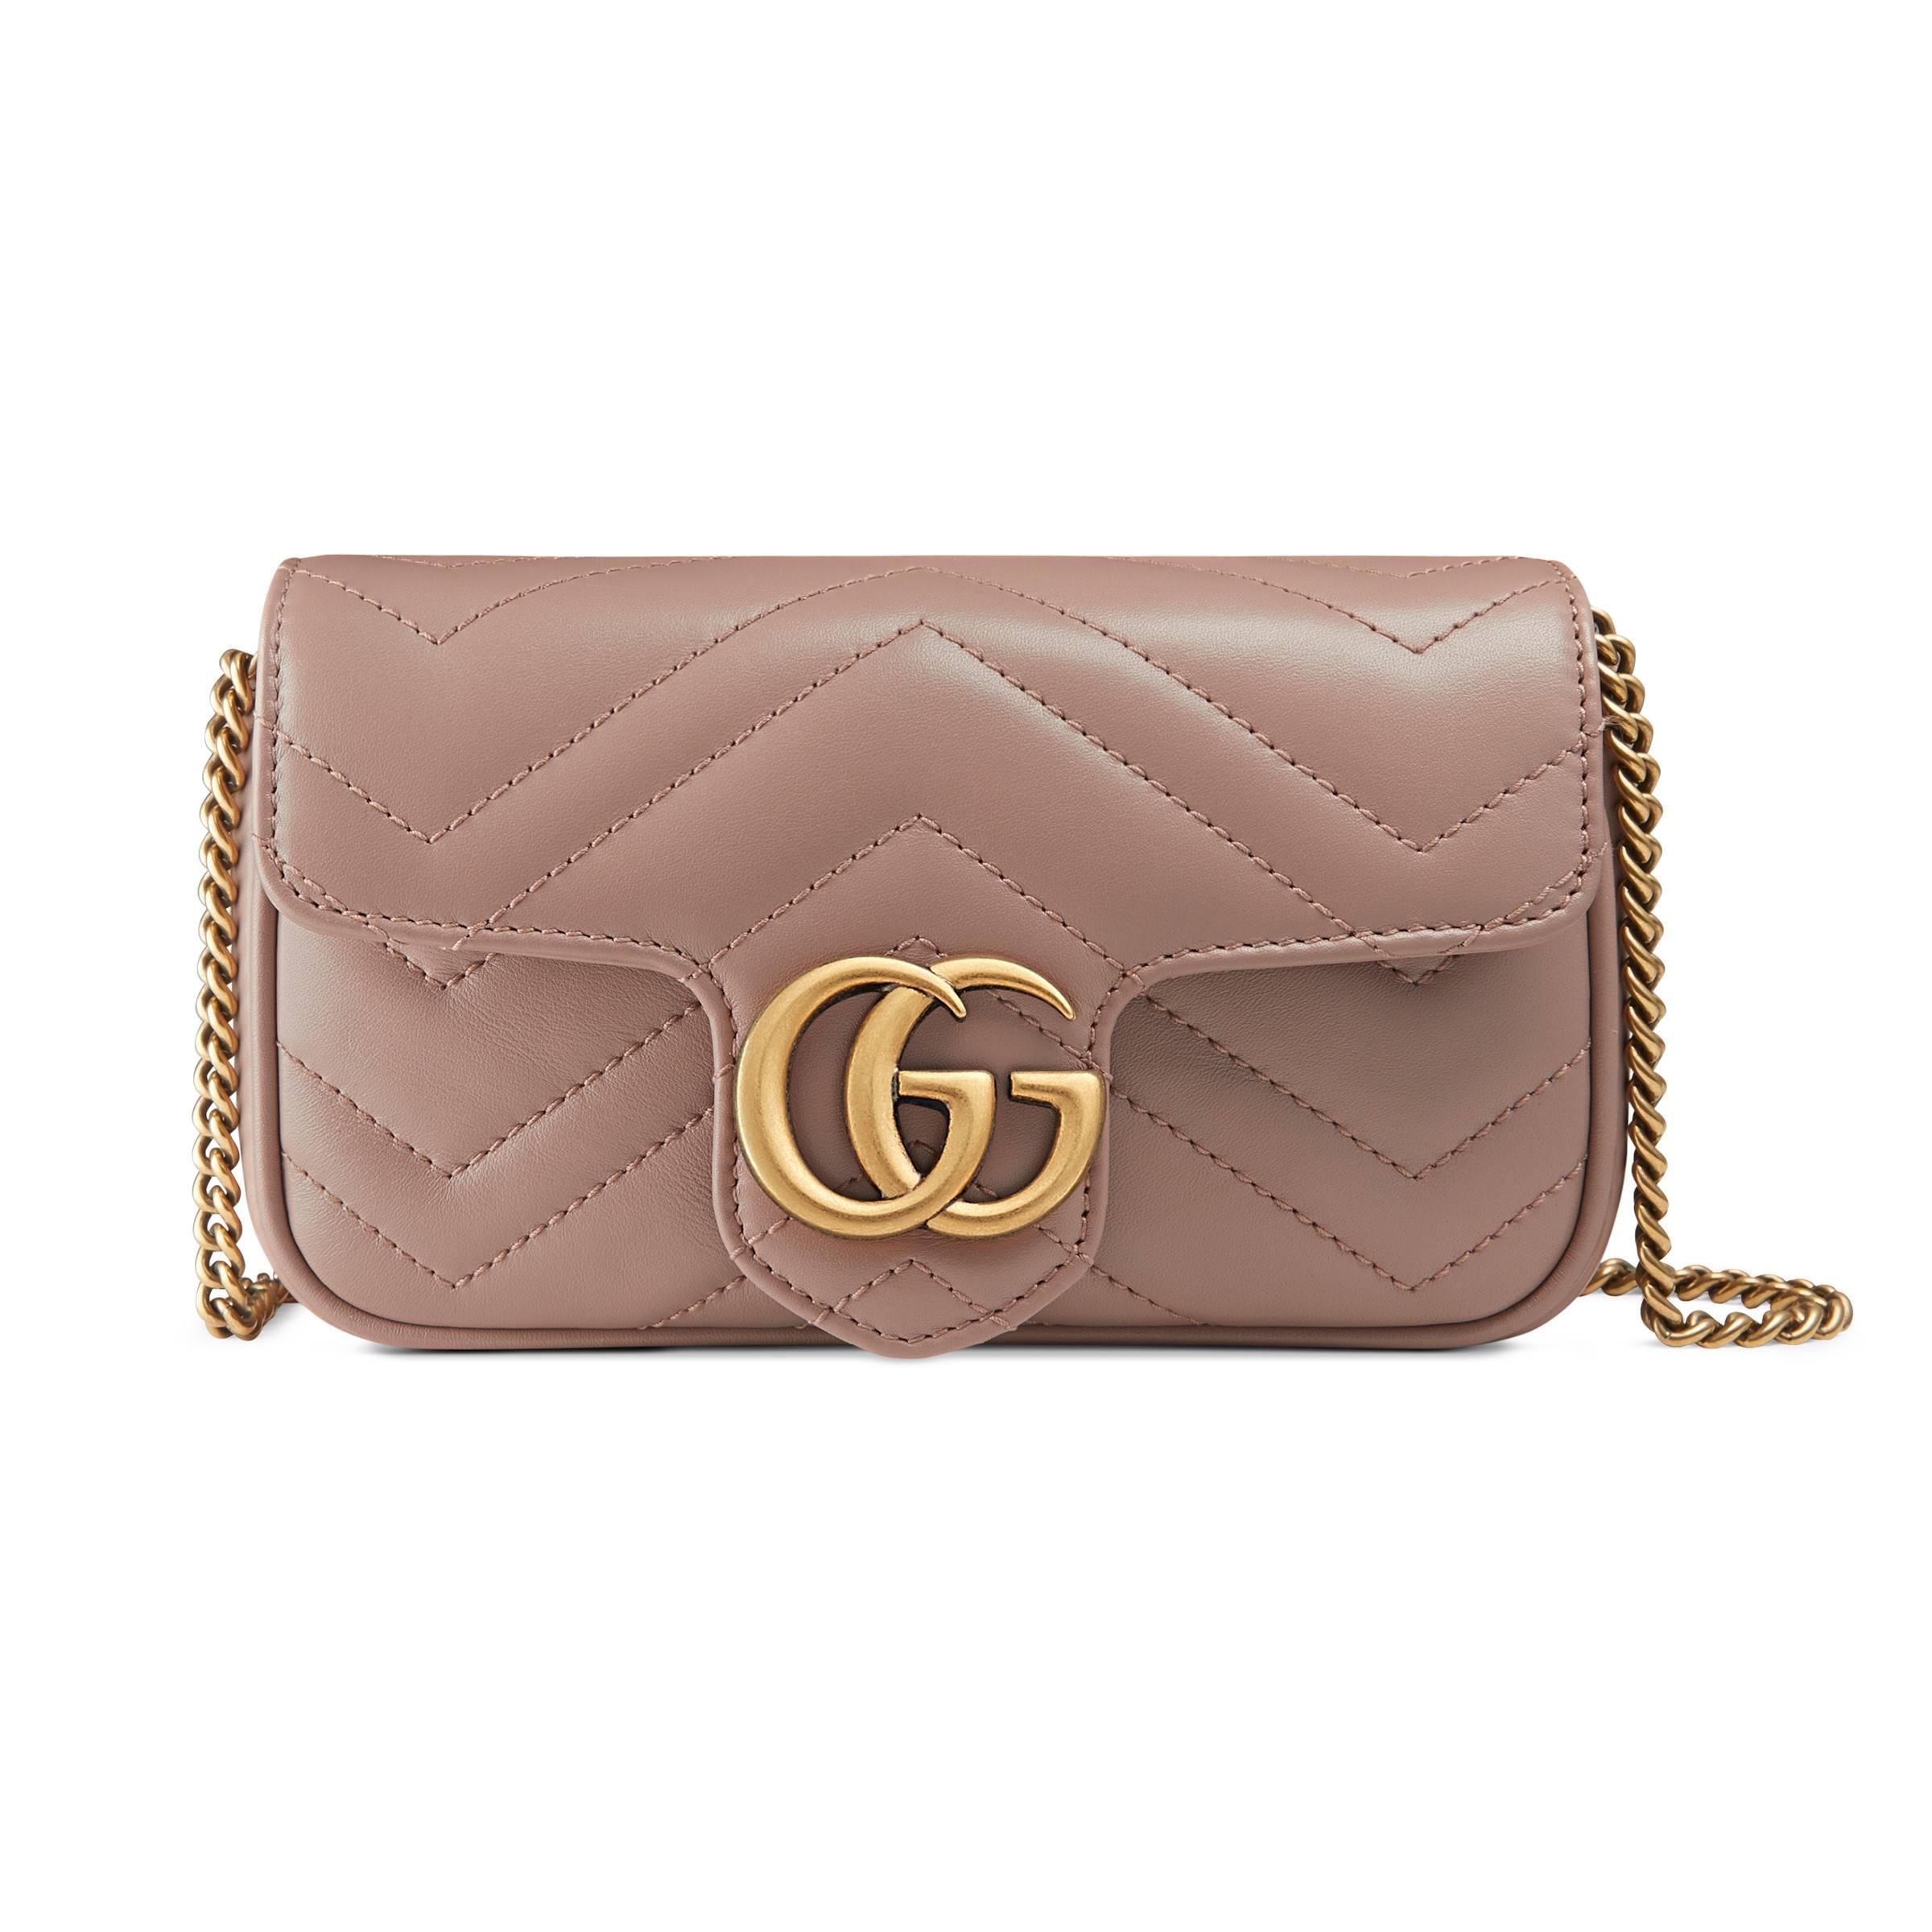 039fe578848 Gucci Gg Marmont Matelassé Leather Super Mini Bag in Pink - Lyst